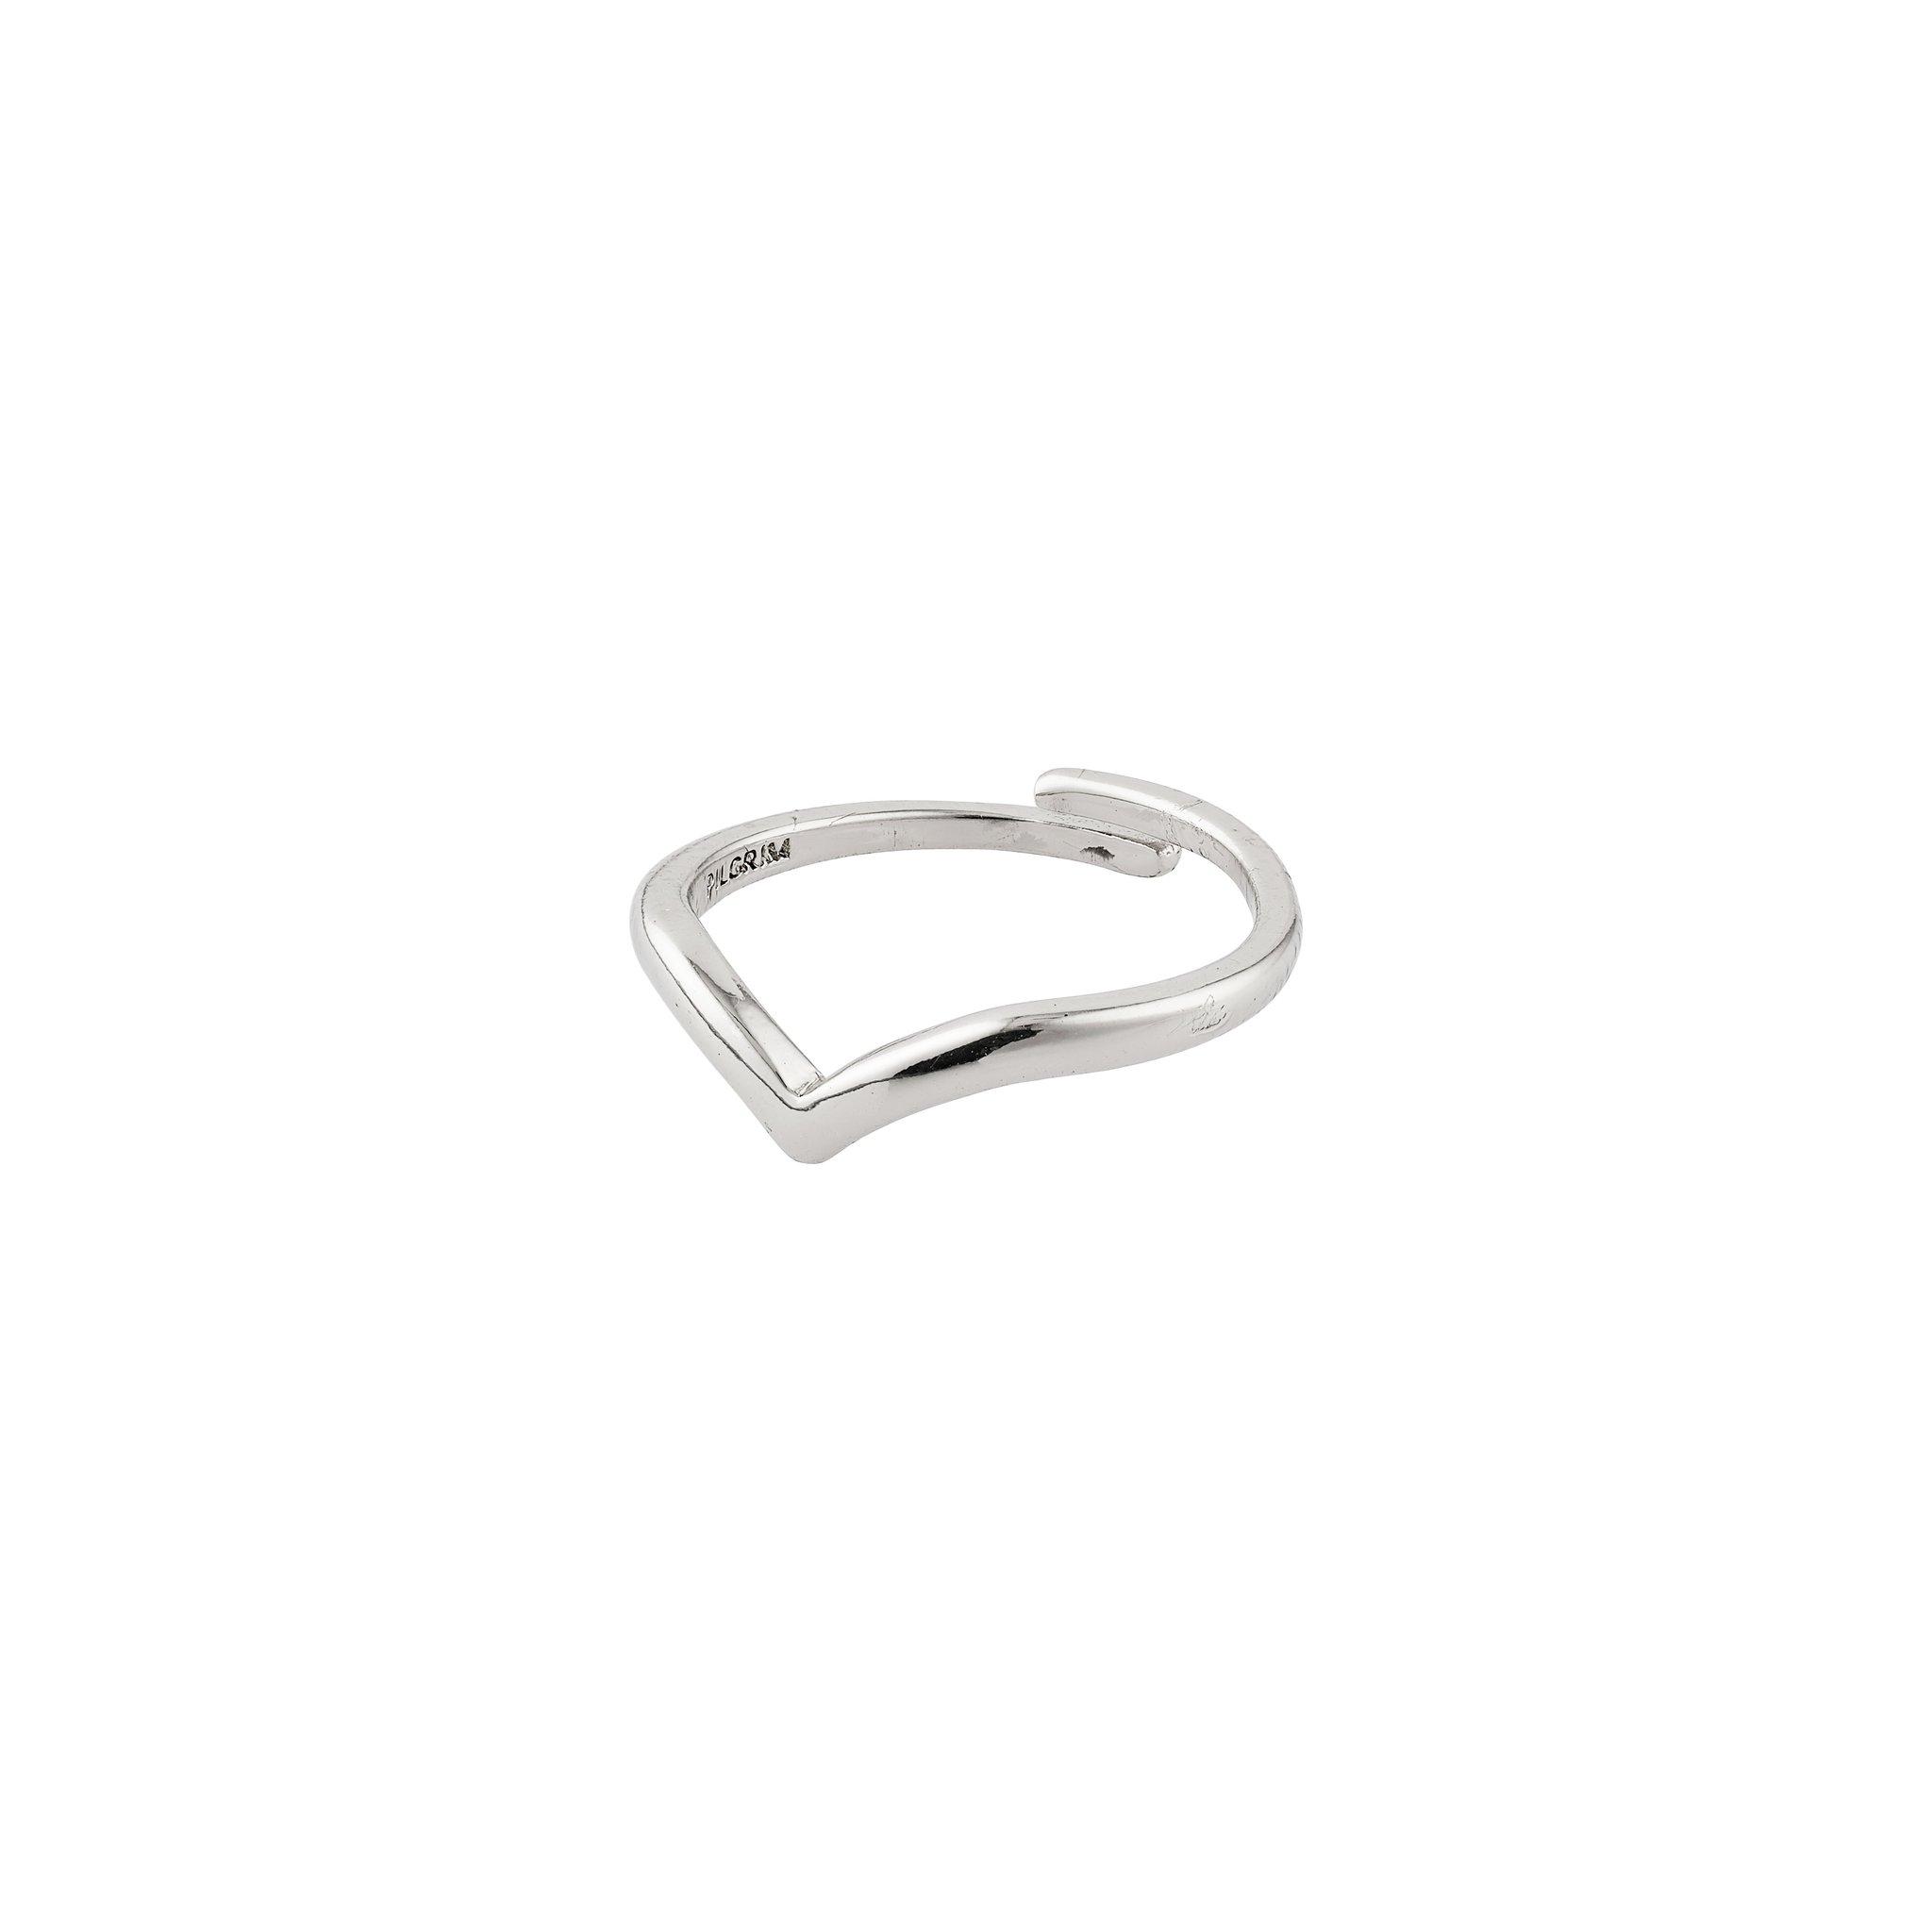 Pilgrim Lulu 1 ring, sølv